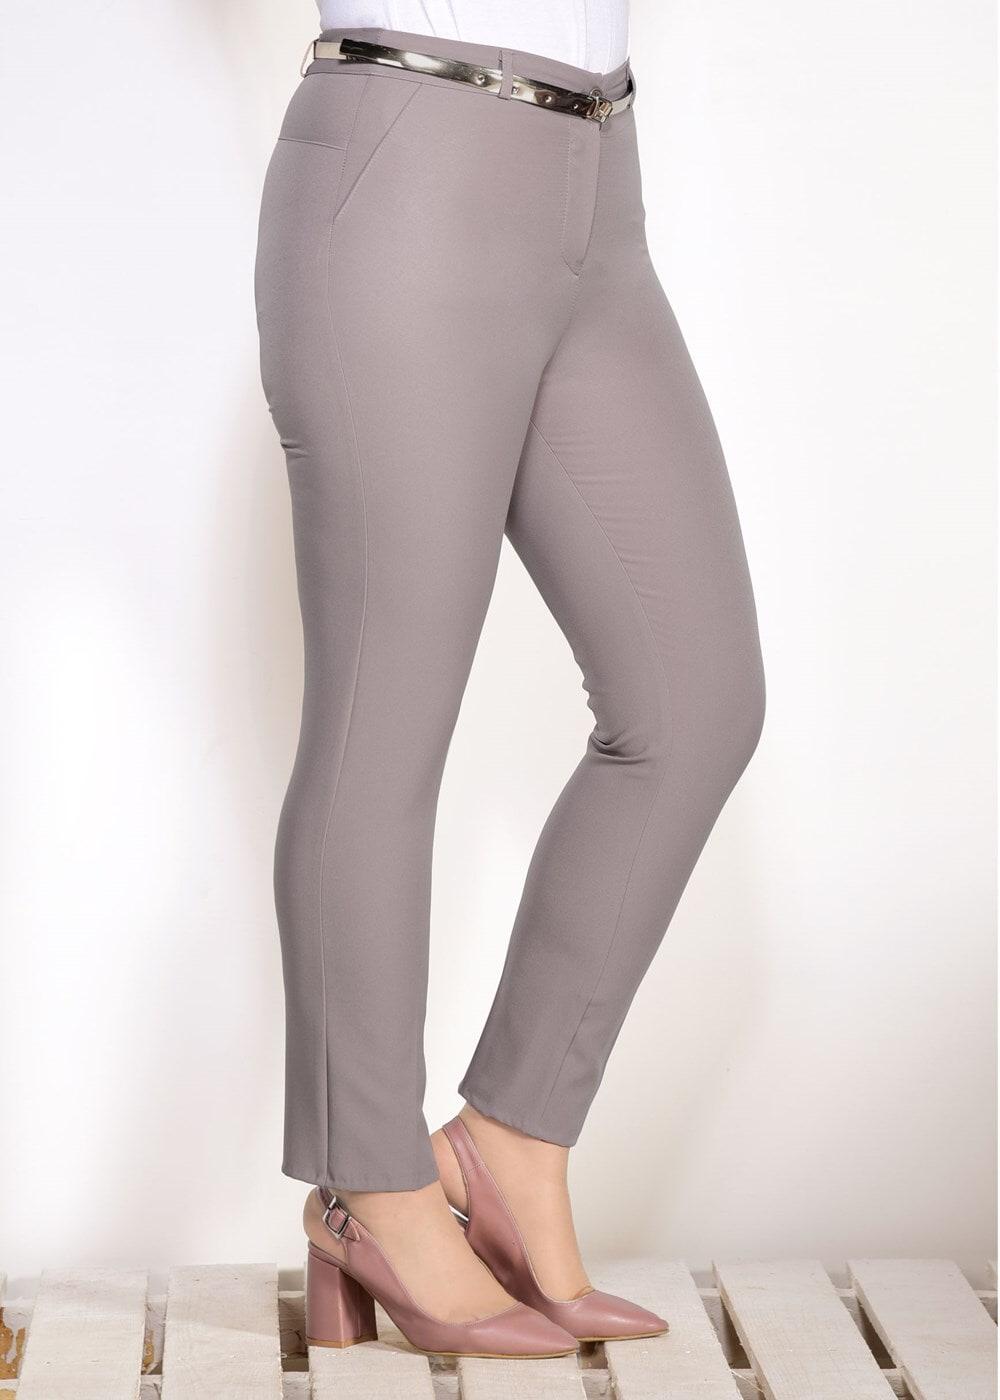 Femelle VISON T 7602 Amine Hüma- Kemer Detaylı Pantolon